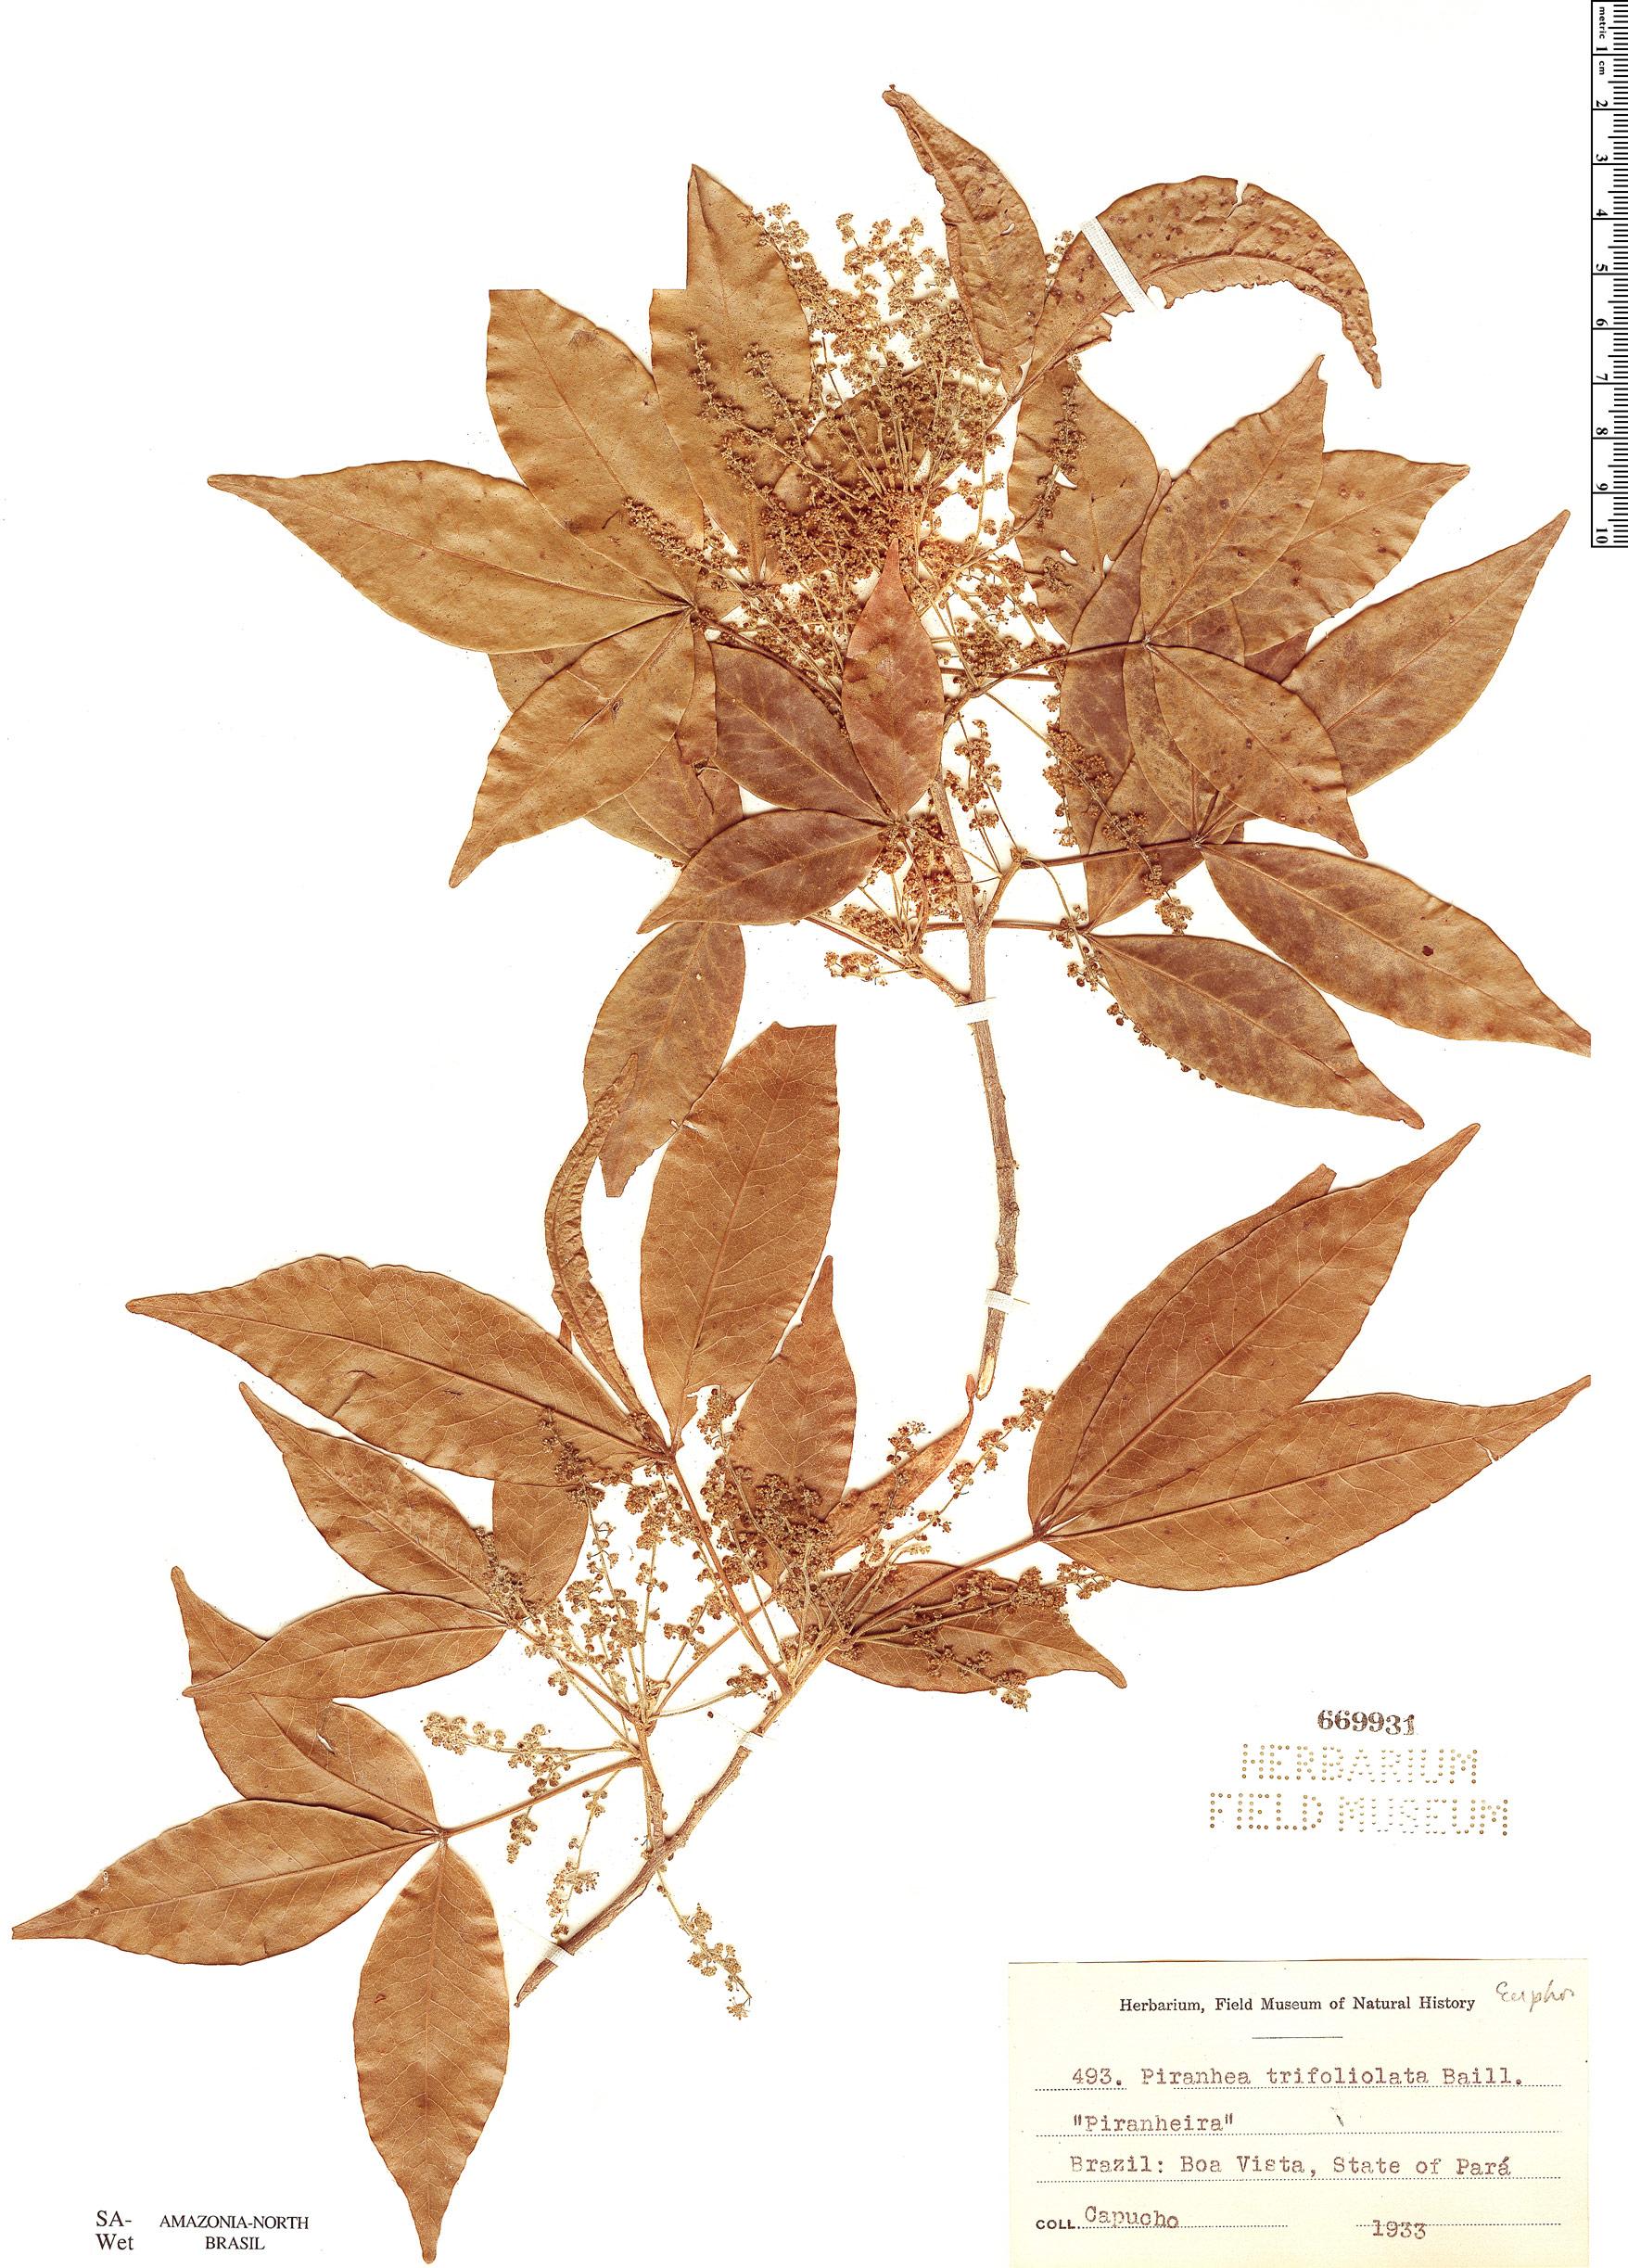 Espécimen: Piranhea trifoliata